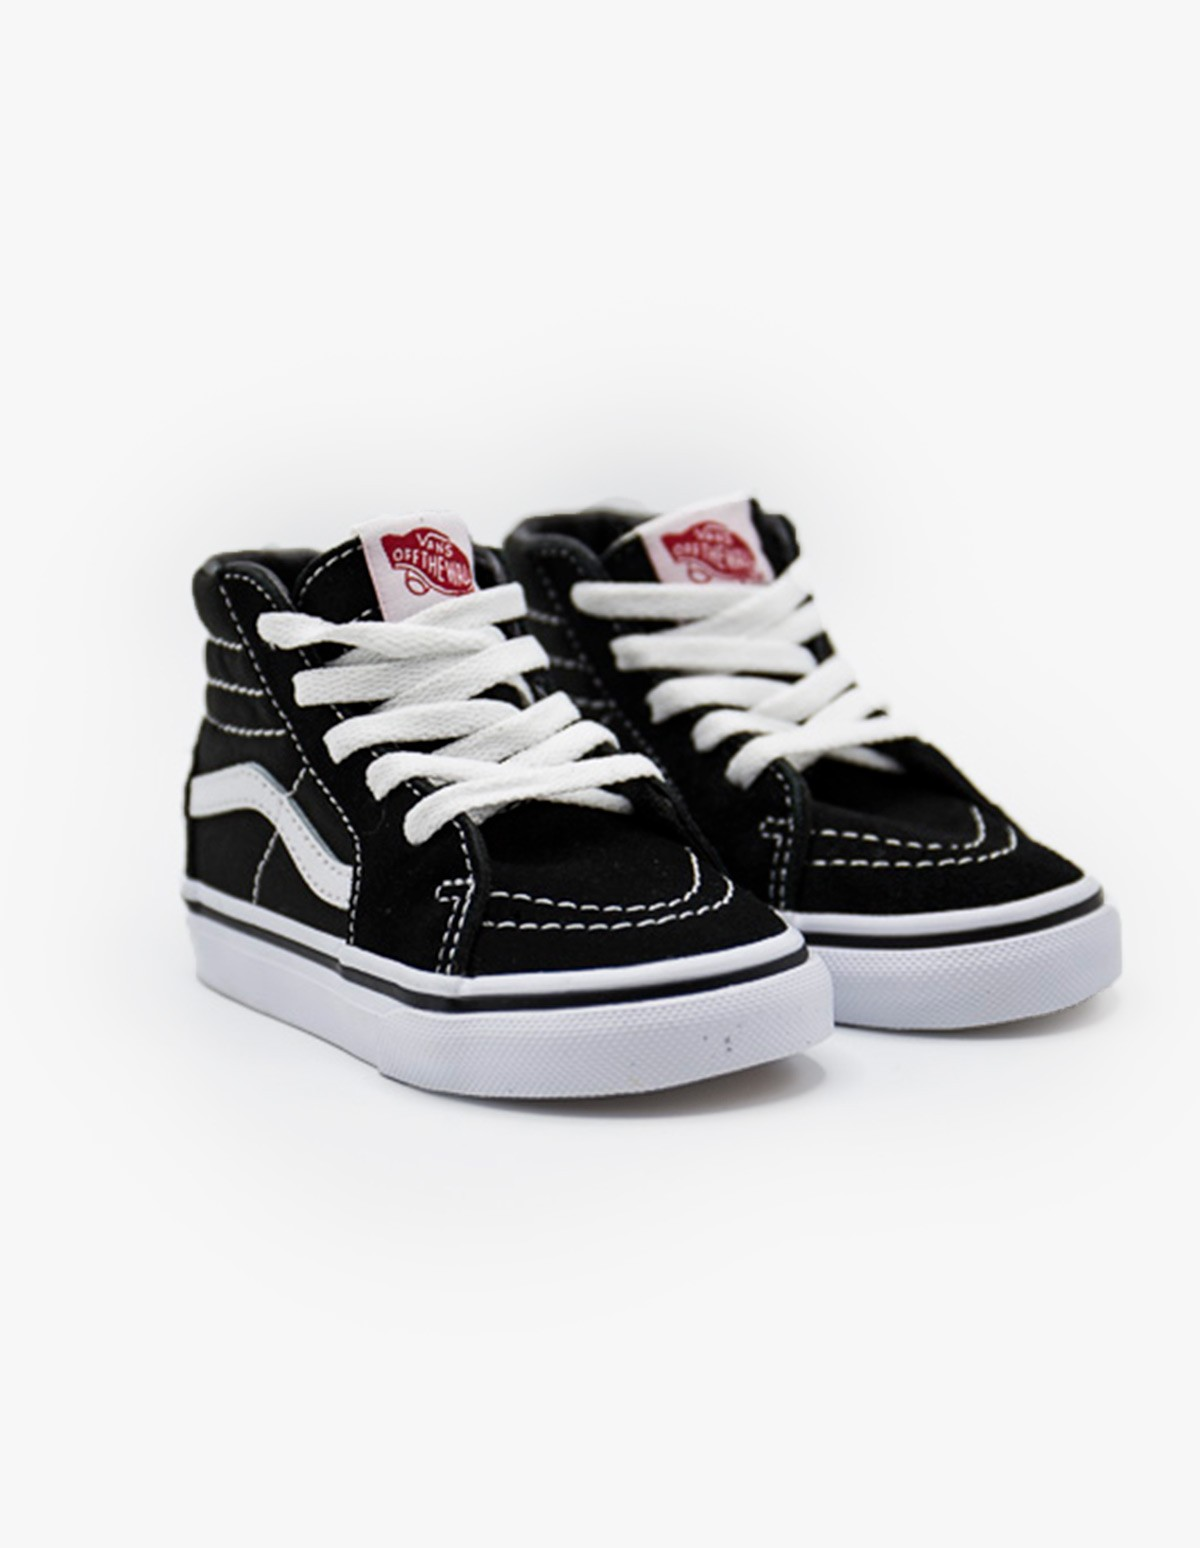 Vans Sk8-Hi (Youth) in Black / White